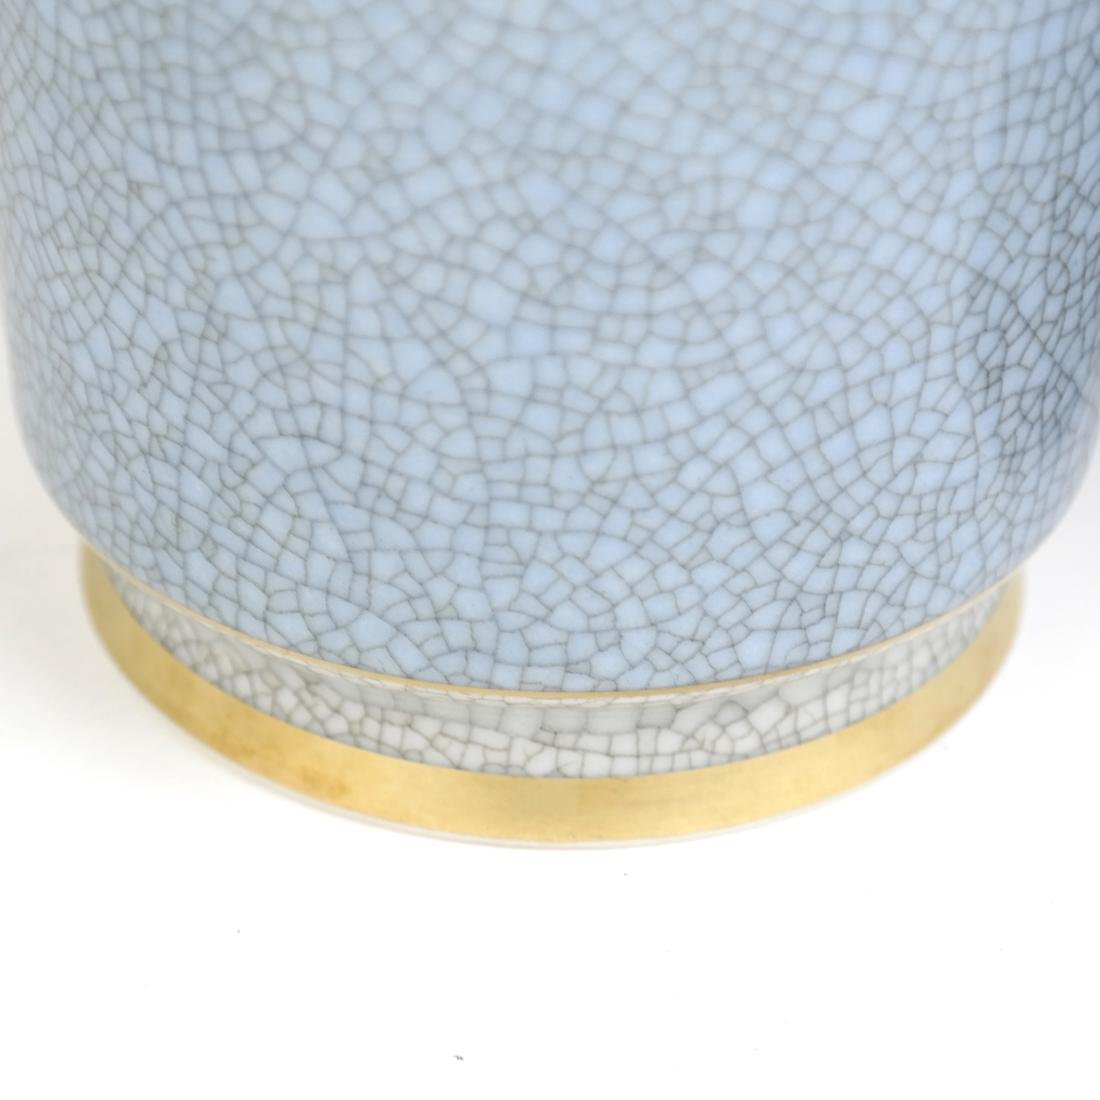 Royal Copenhagen Vase and Lamp - 4